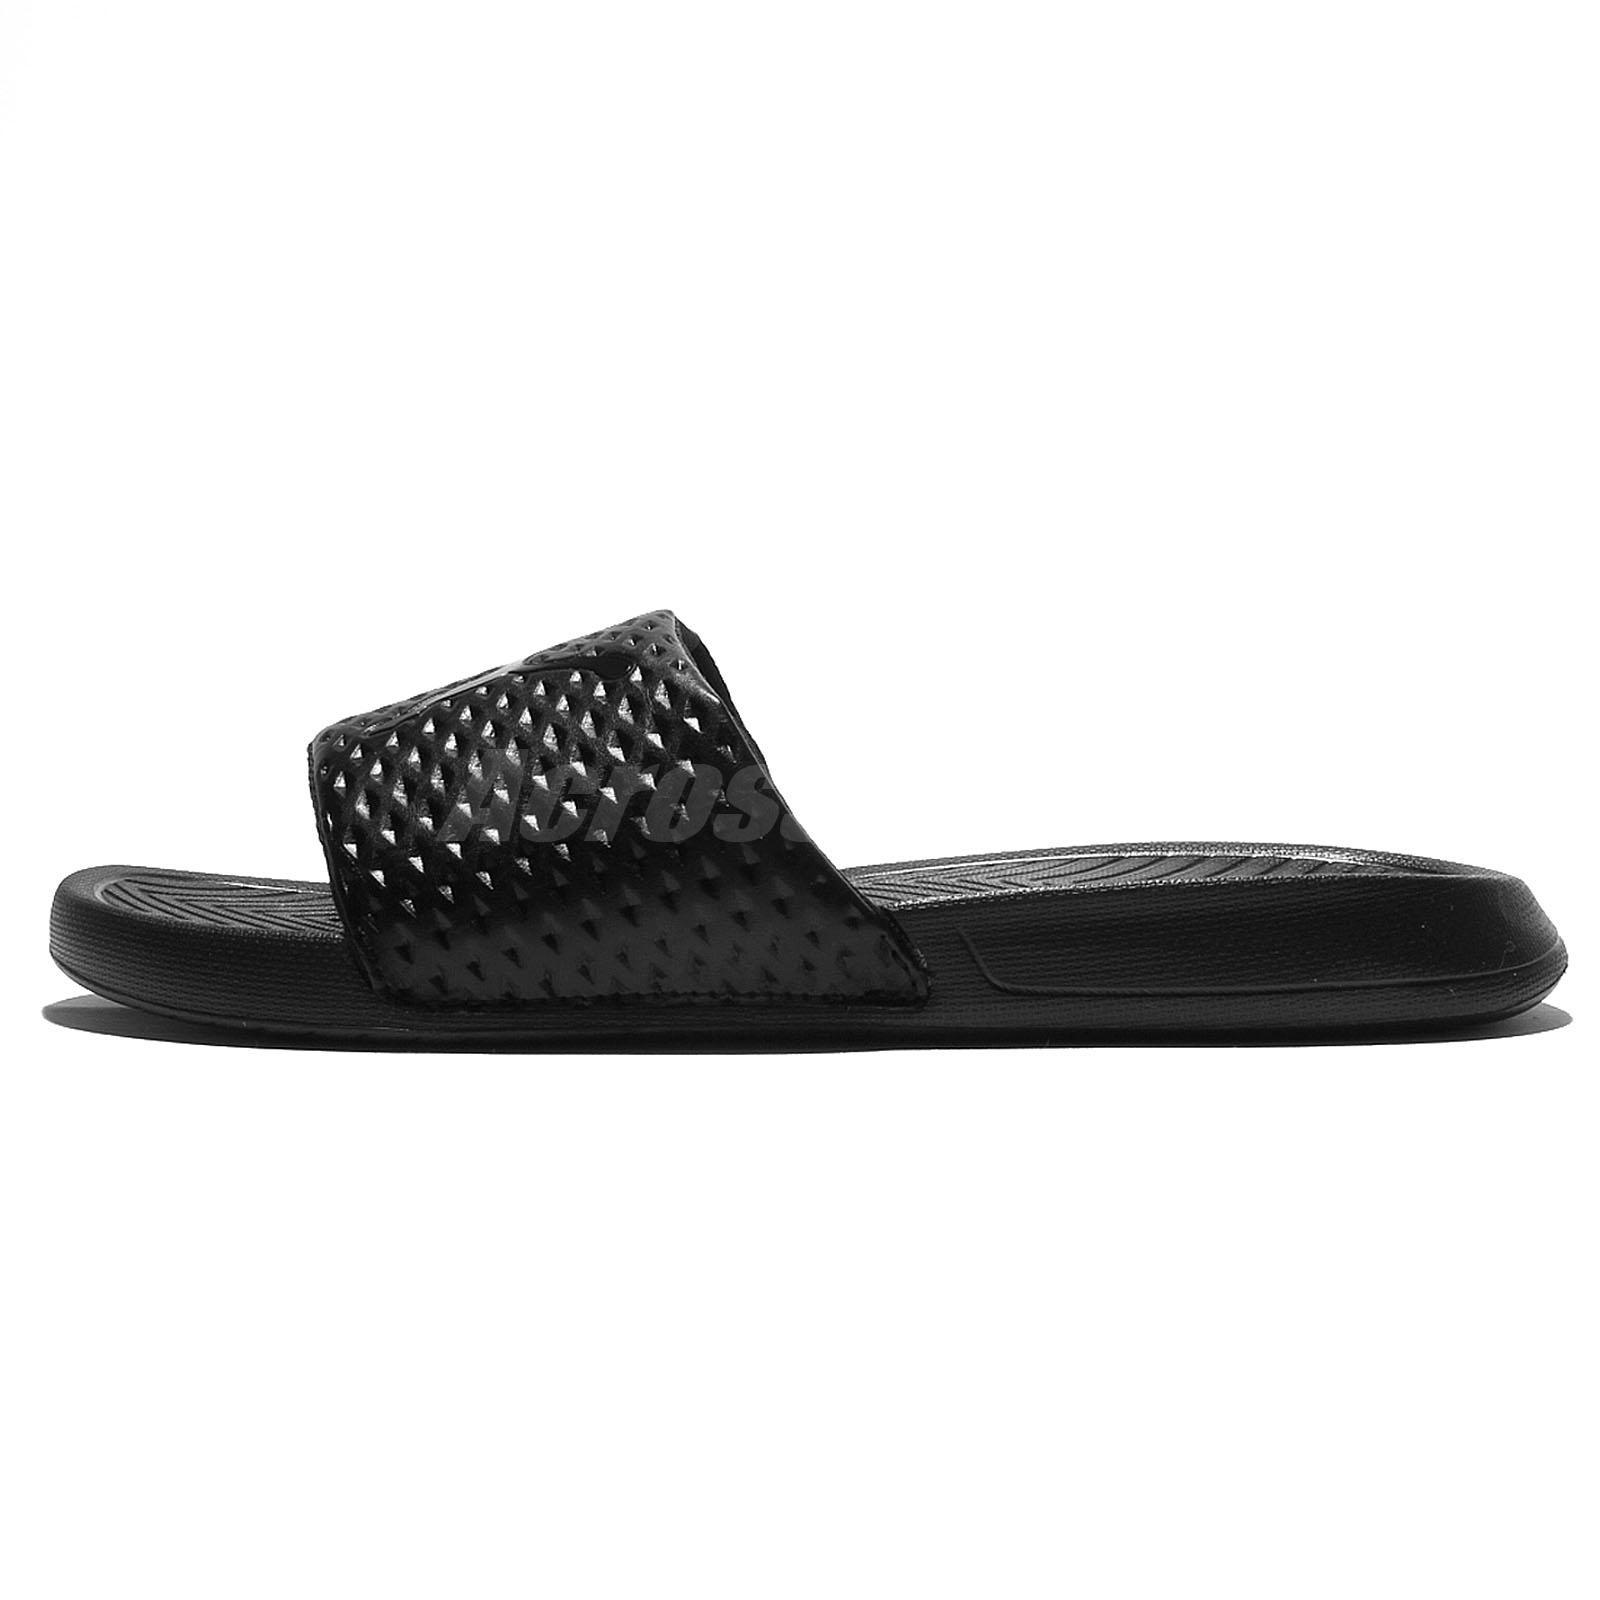 bc09b53b3db3 Puma Popcat Premium Black Men Sandal Slides Slippers 362458-02